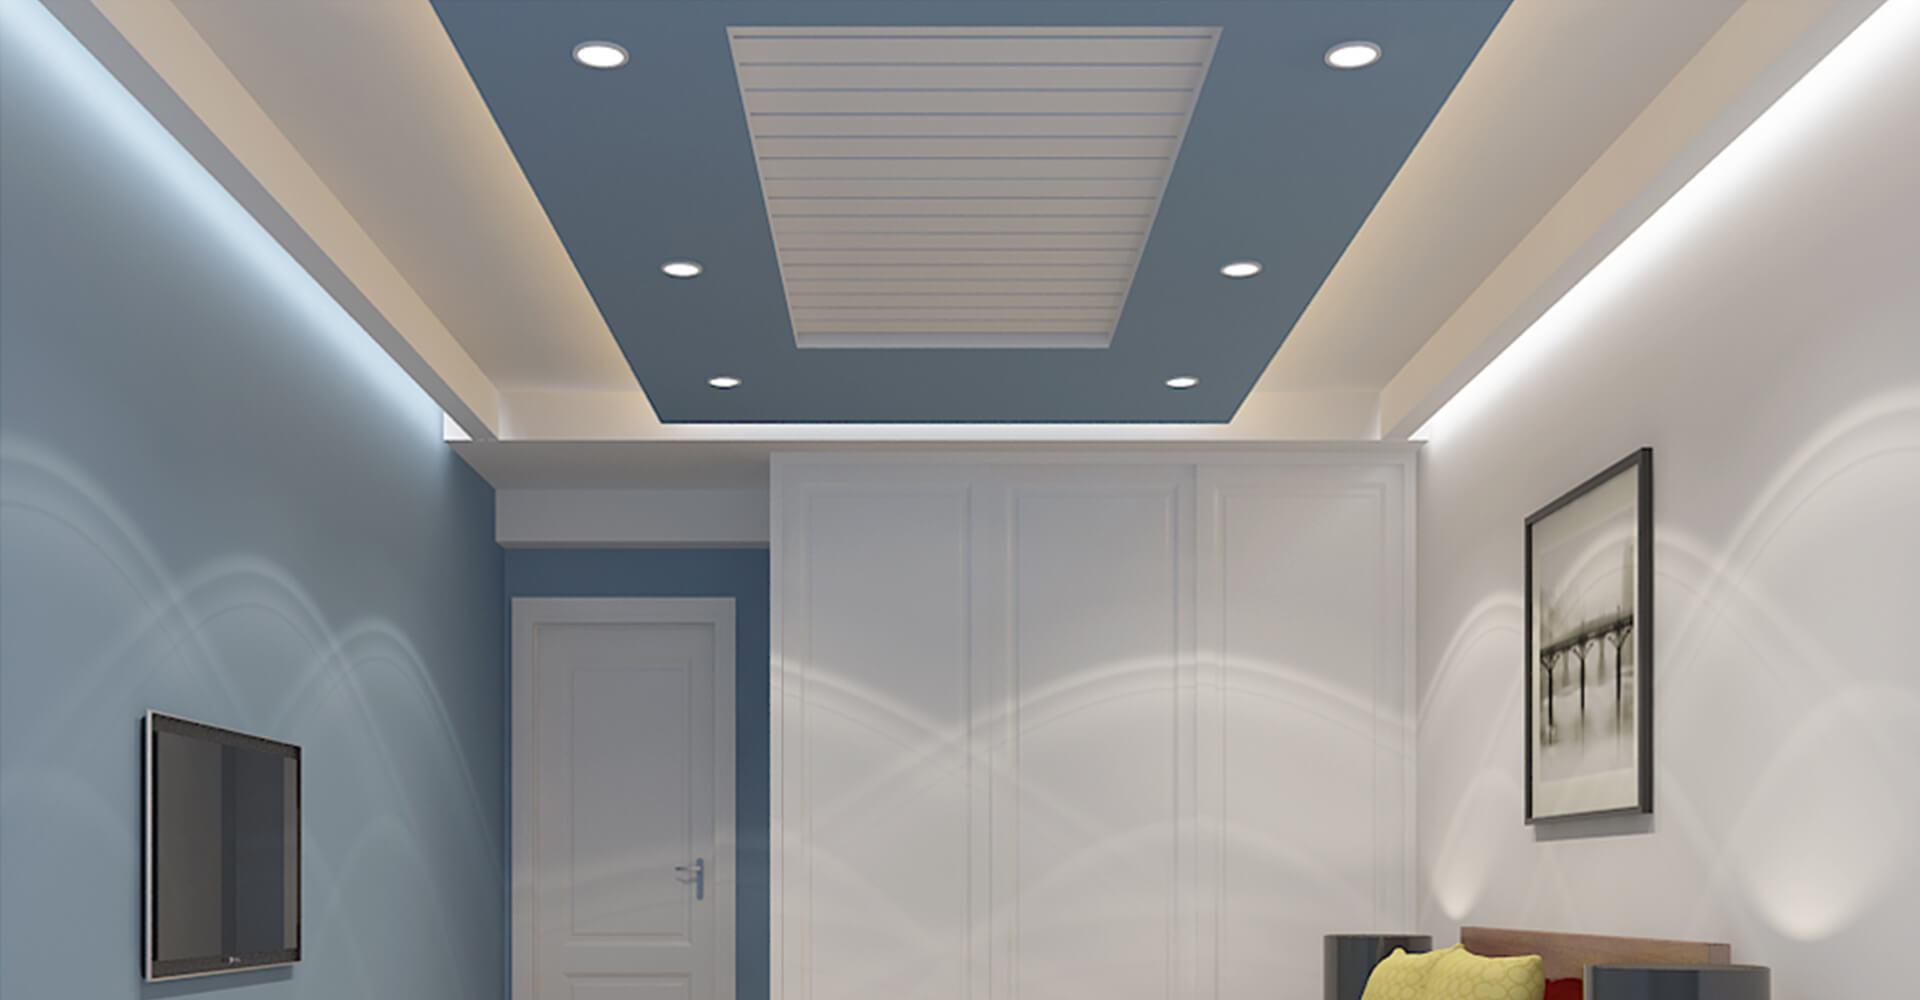 60 Contoh Desain Plafon Minimalis Terbaru 2021 Beserta Harga Rumahpedia